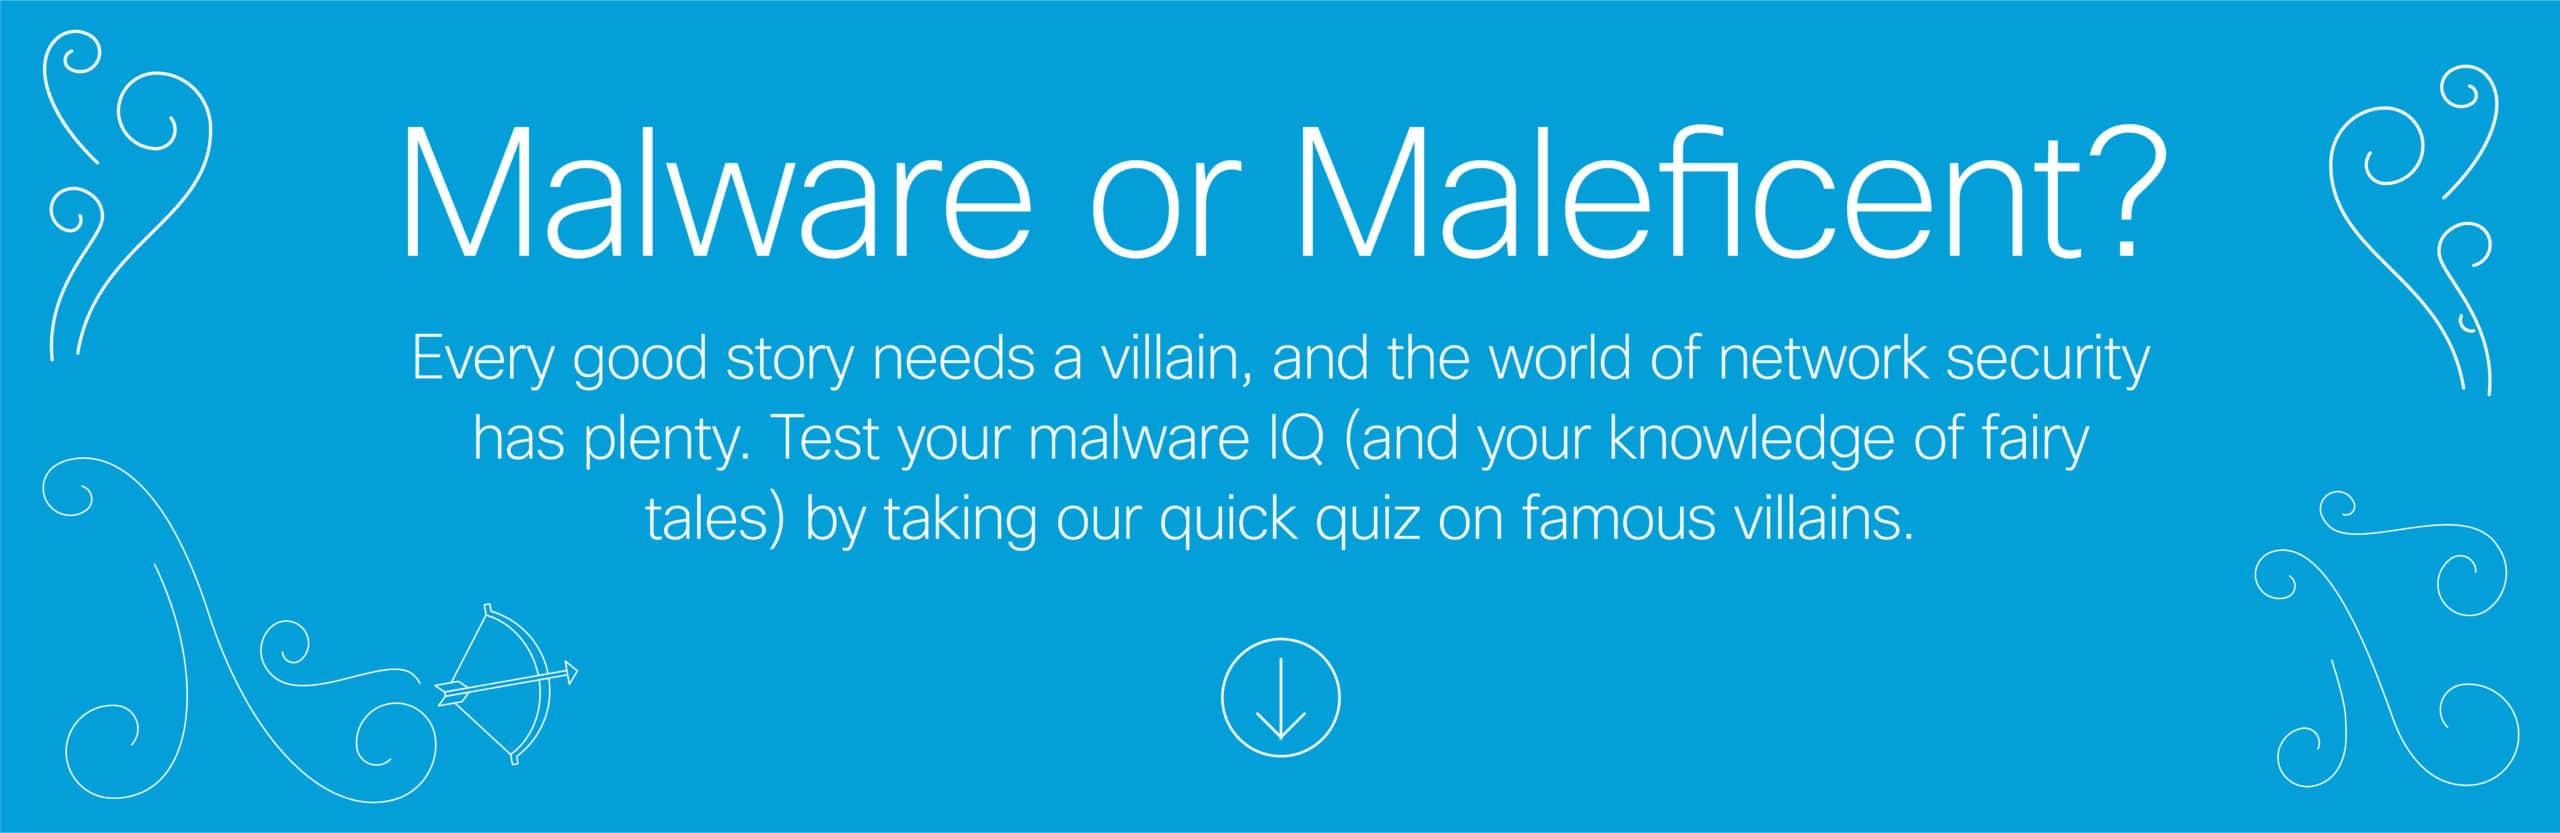 Malware or Maleficent? Malware IQ Quiz